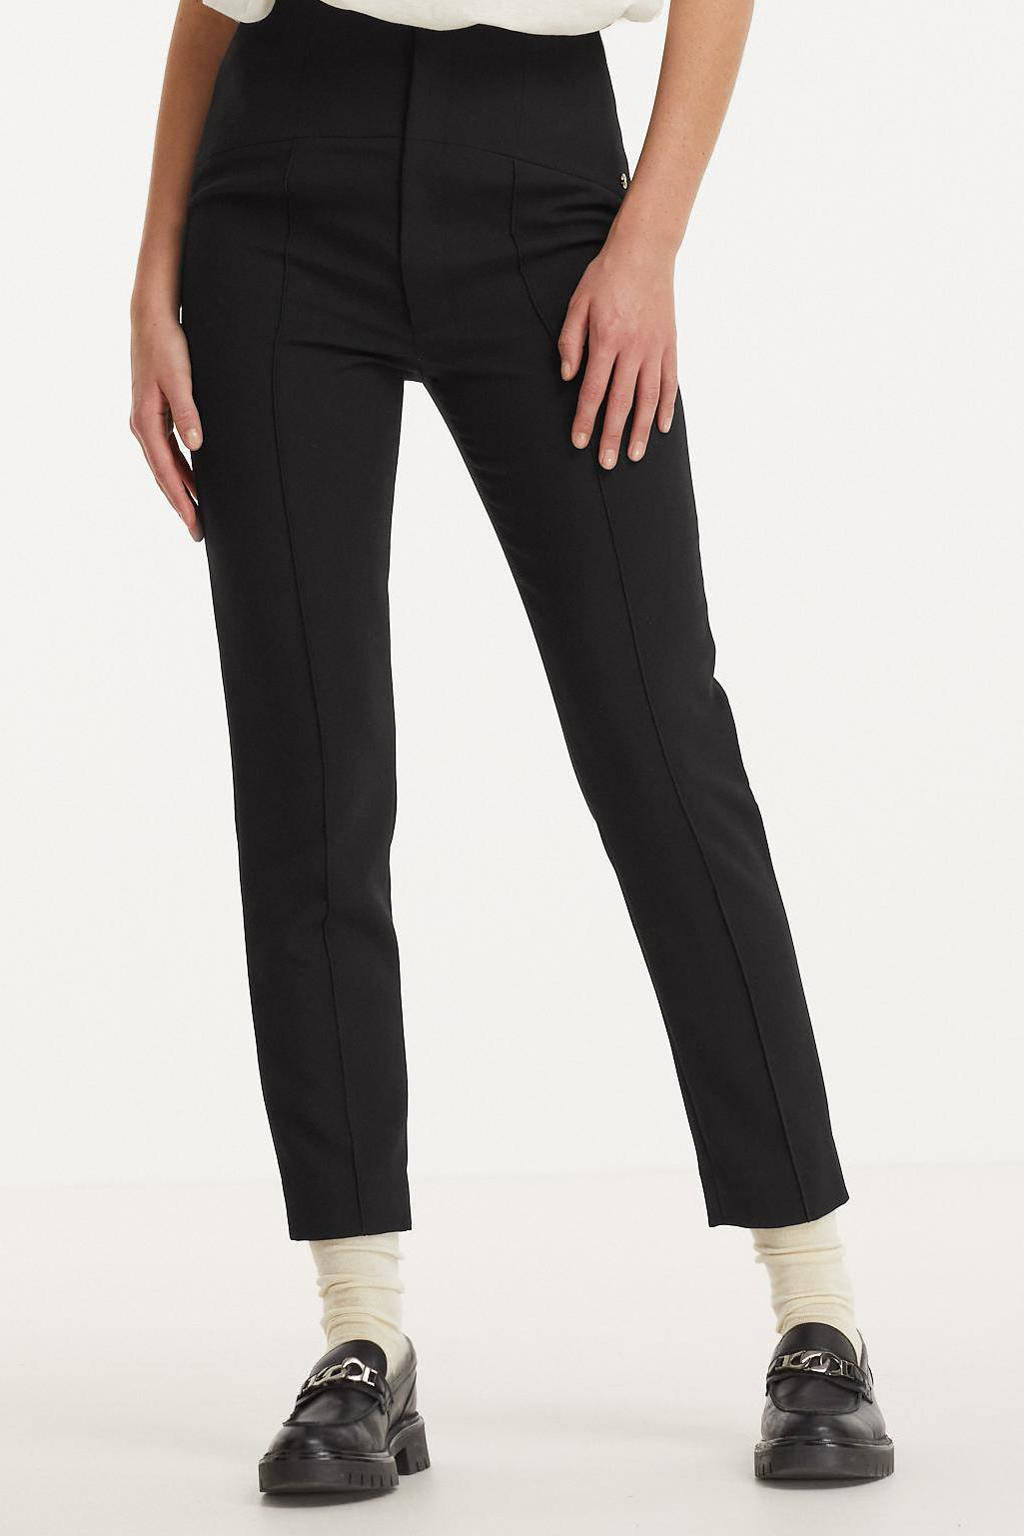 JOSH V high waist skinny broek Celym zwart, Zwart